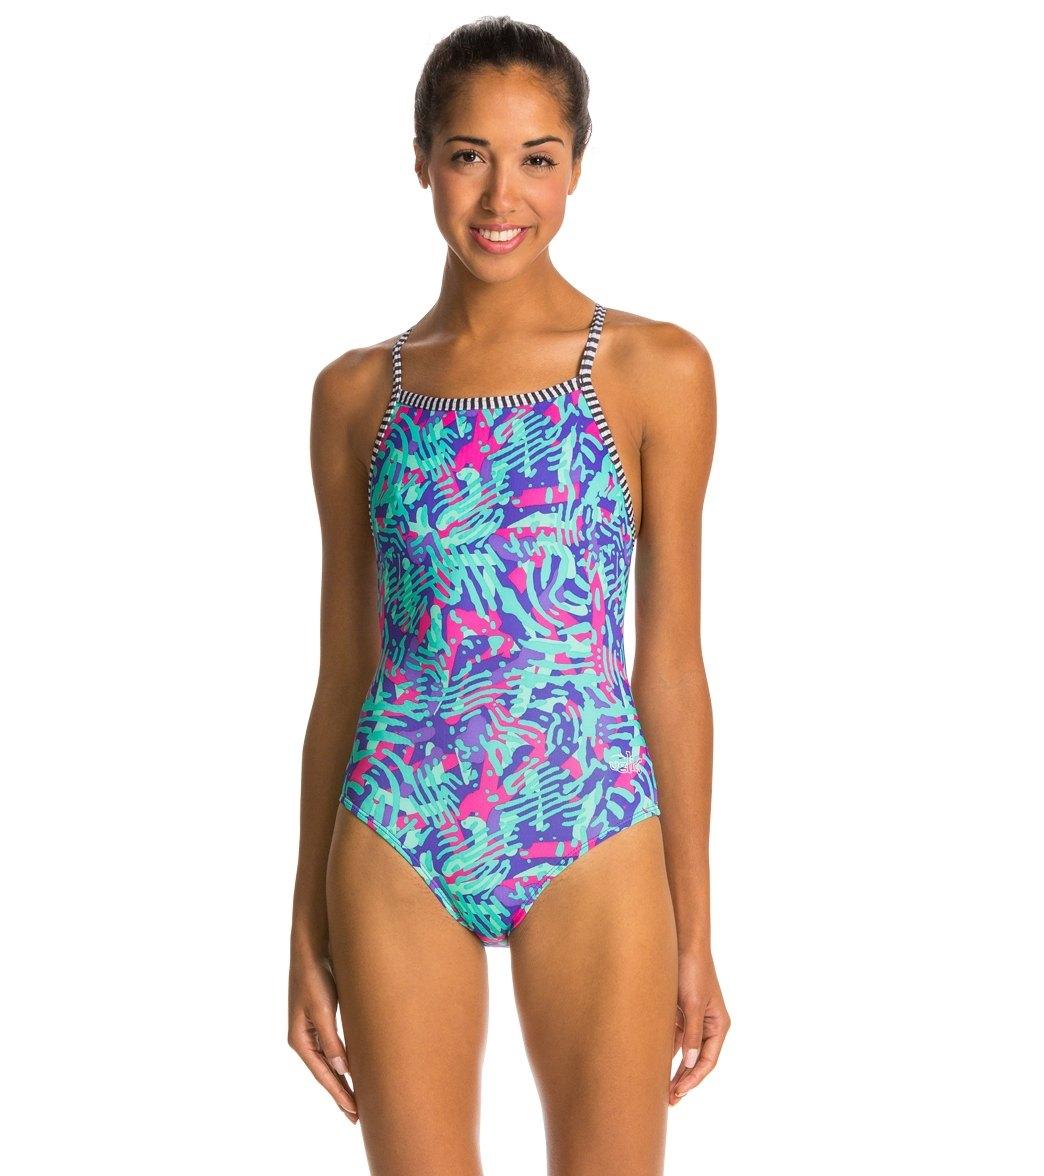 41f54dc6fd Dolfin Uglies Zahara Women's V-2 Back One Piece Swimsuit at ...